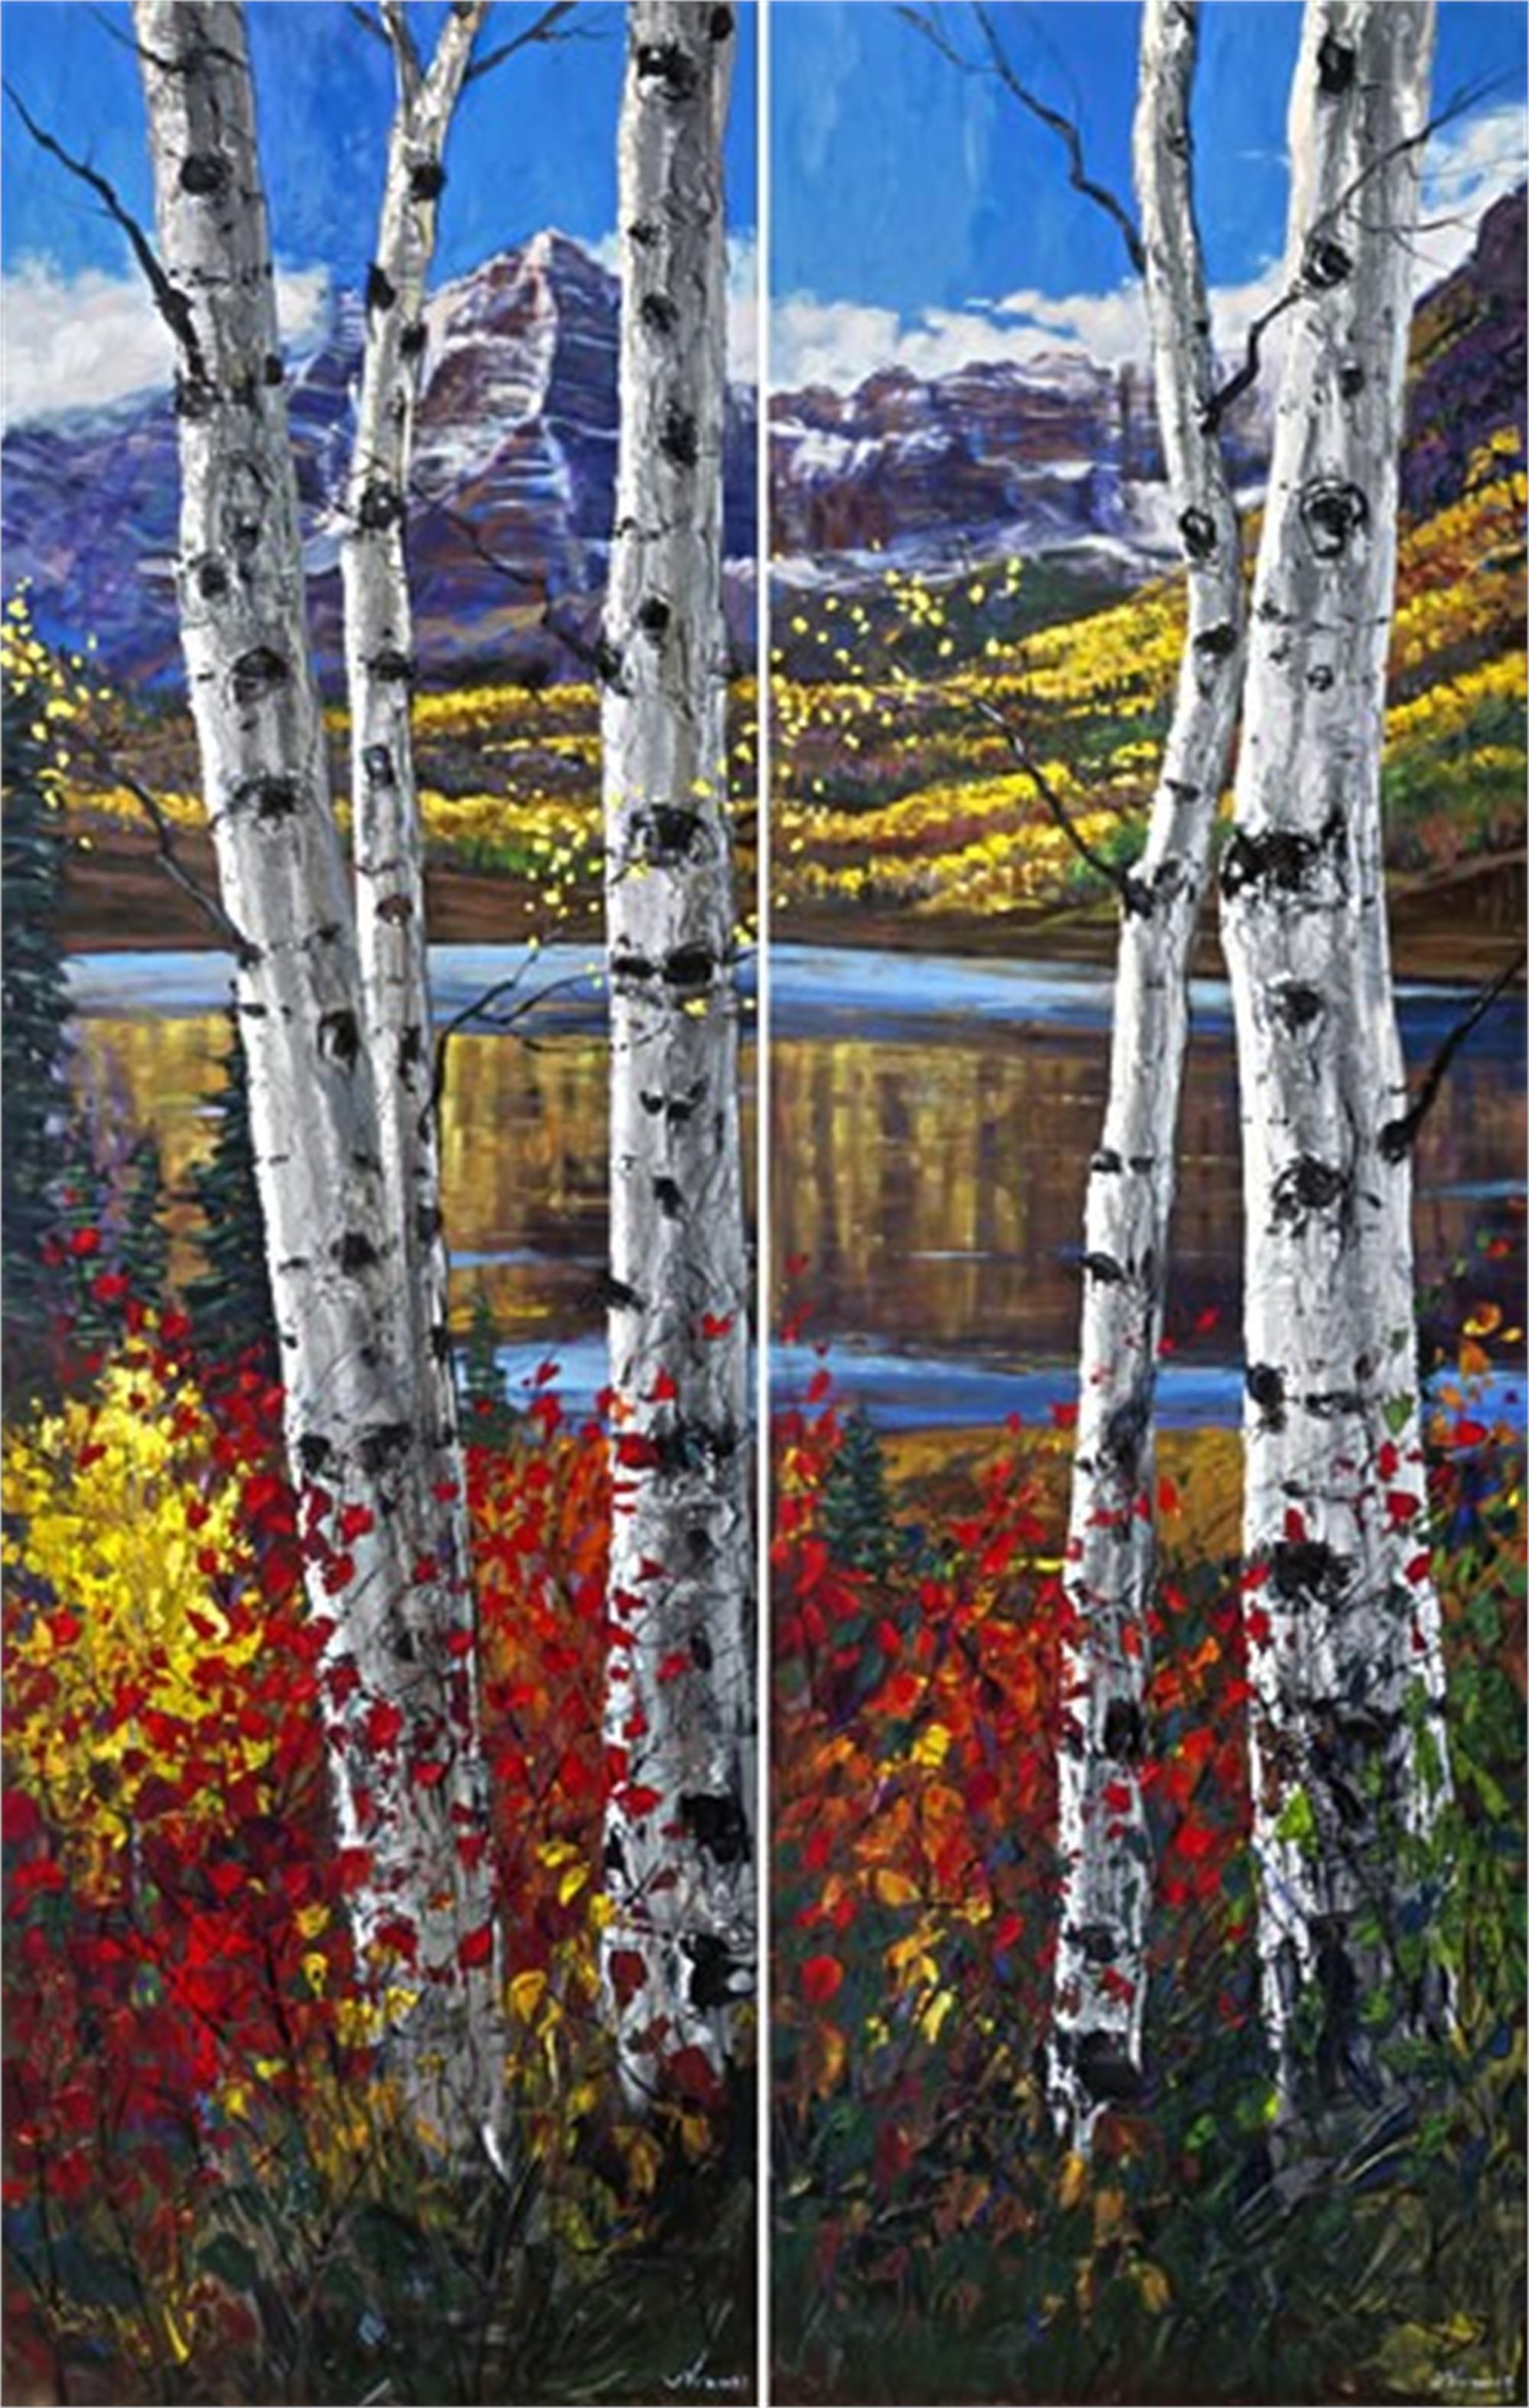 Autumn on Bells (diptych) by Jennifer Vranes